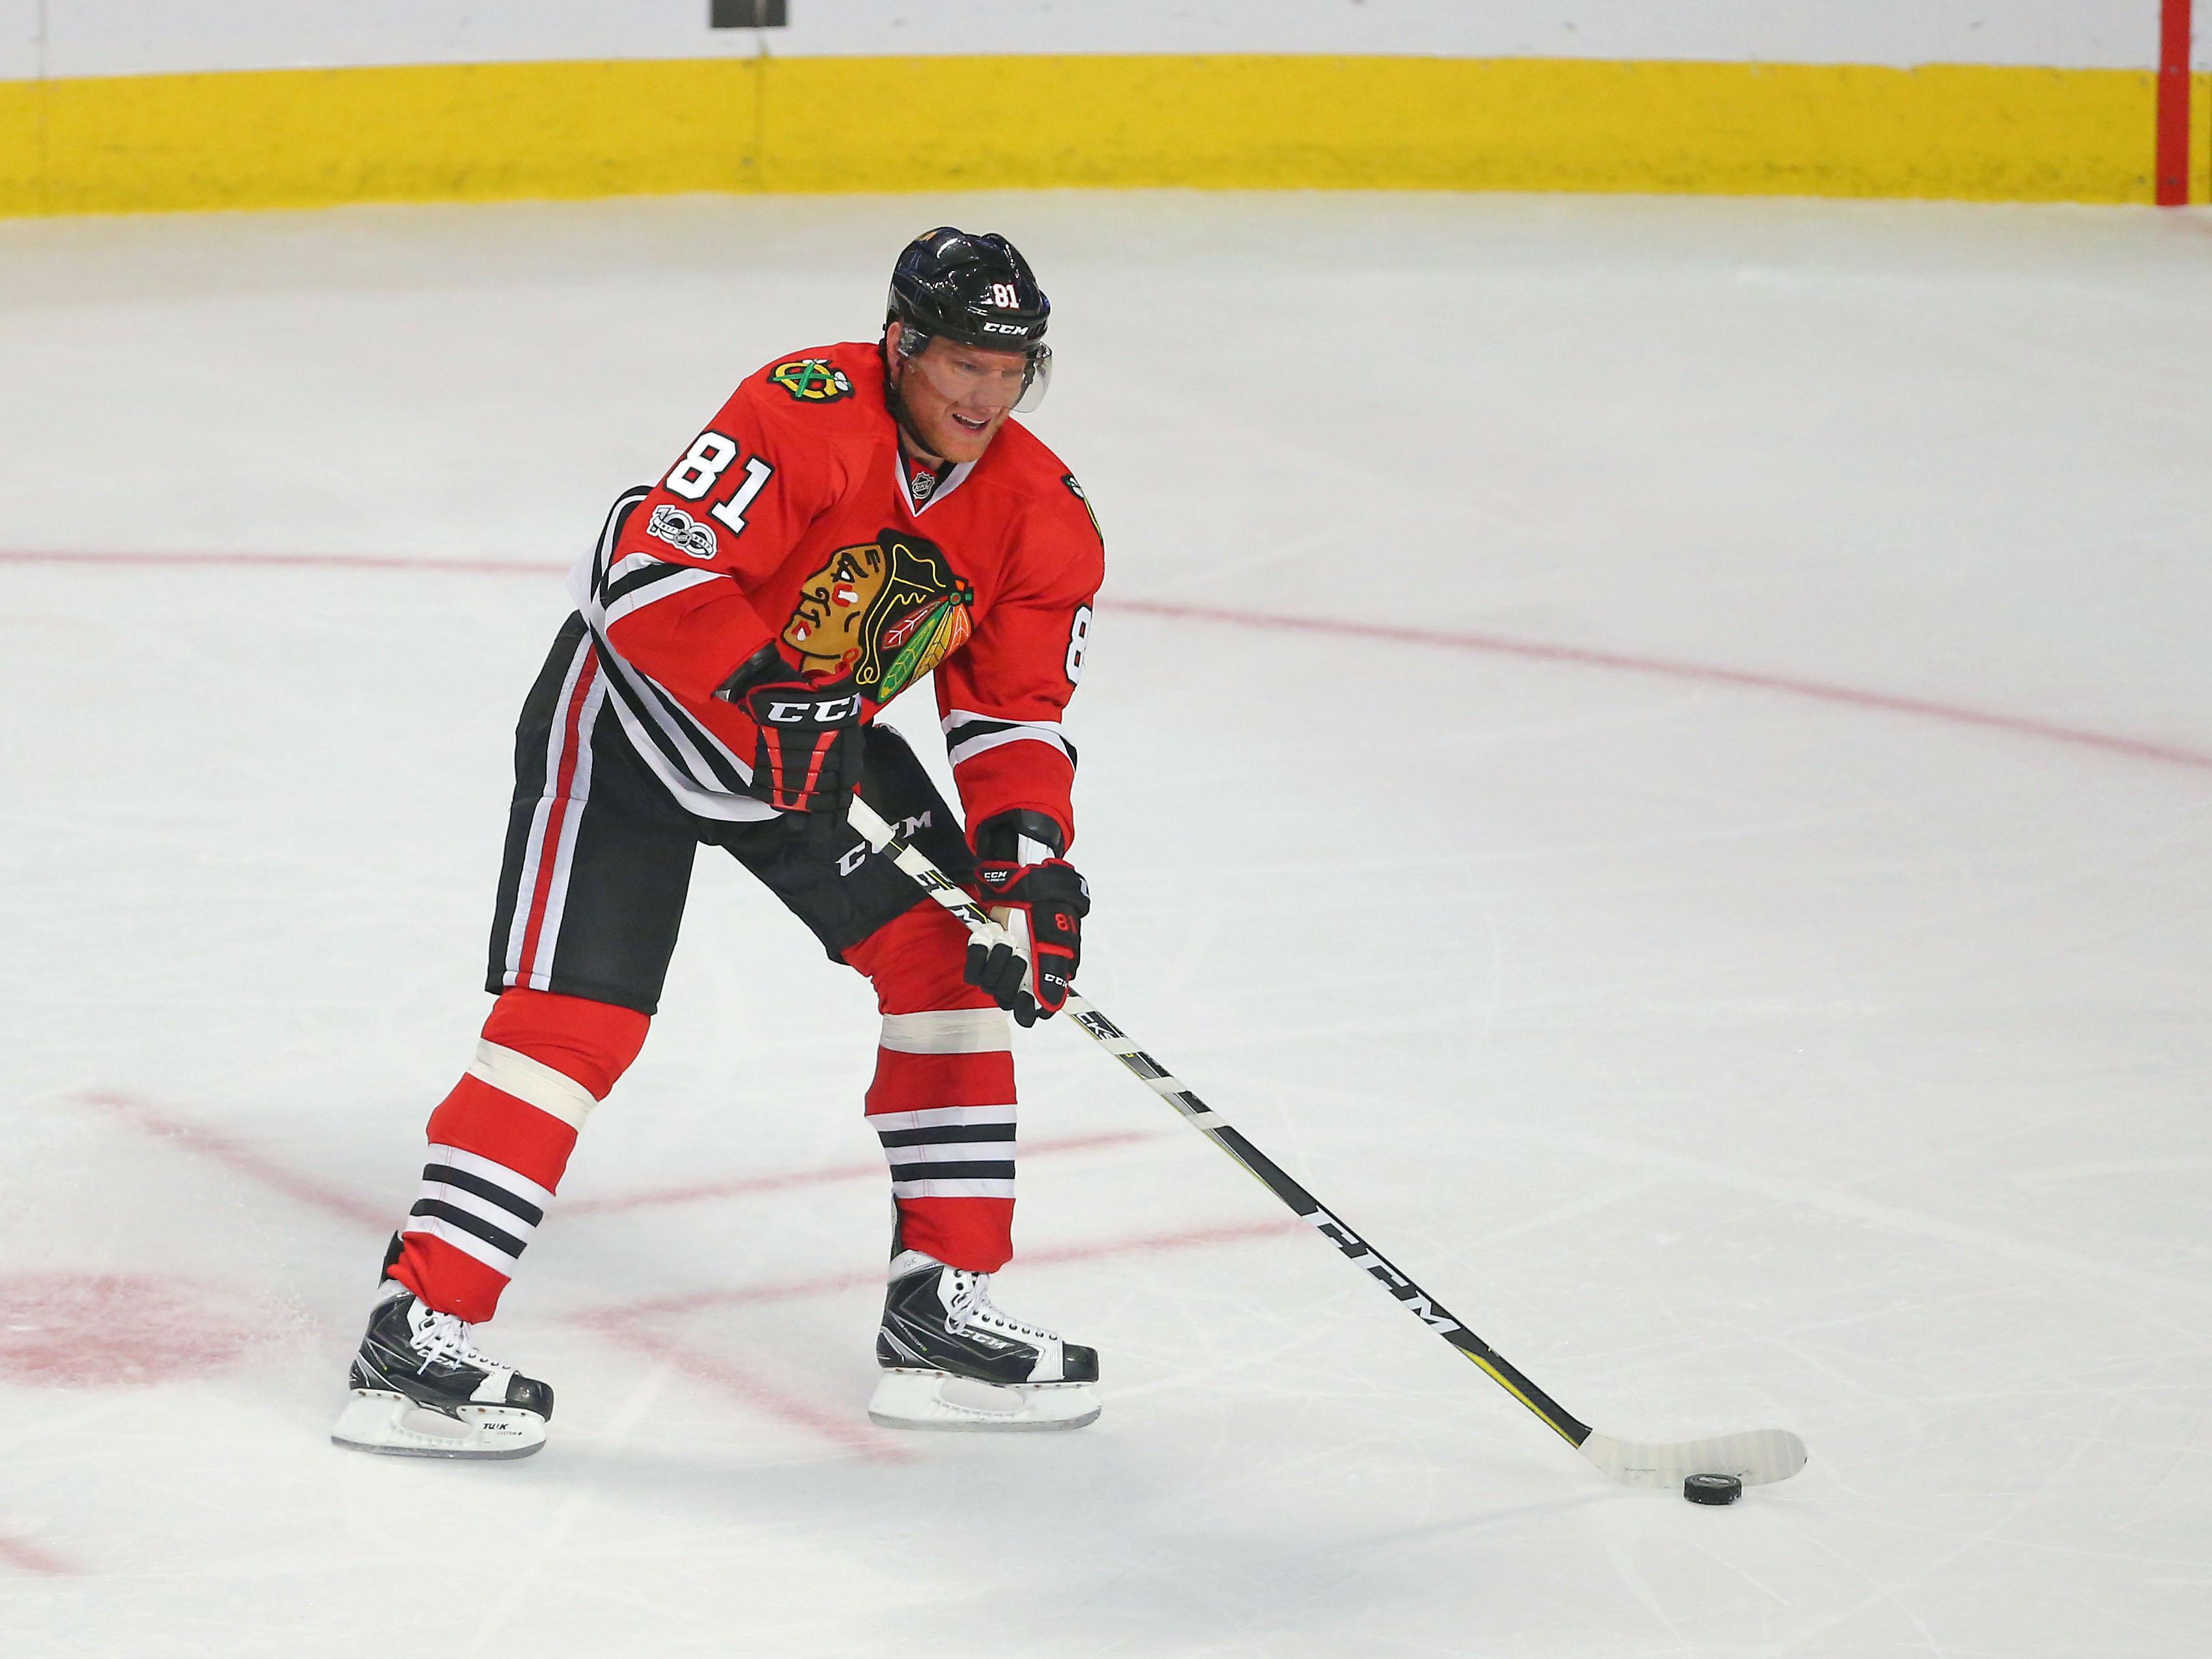 9967375-nhl-dallas-stars-at-chicago-blackhawks